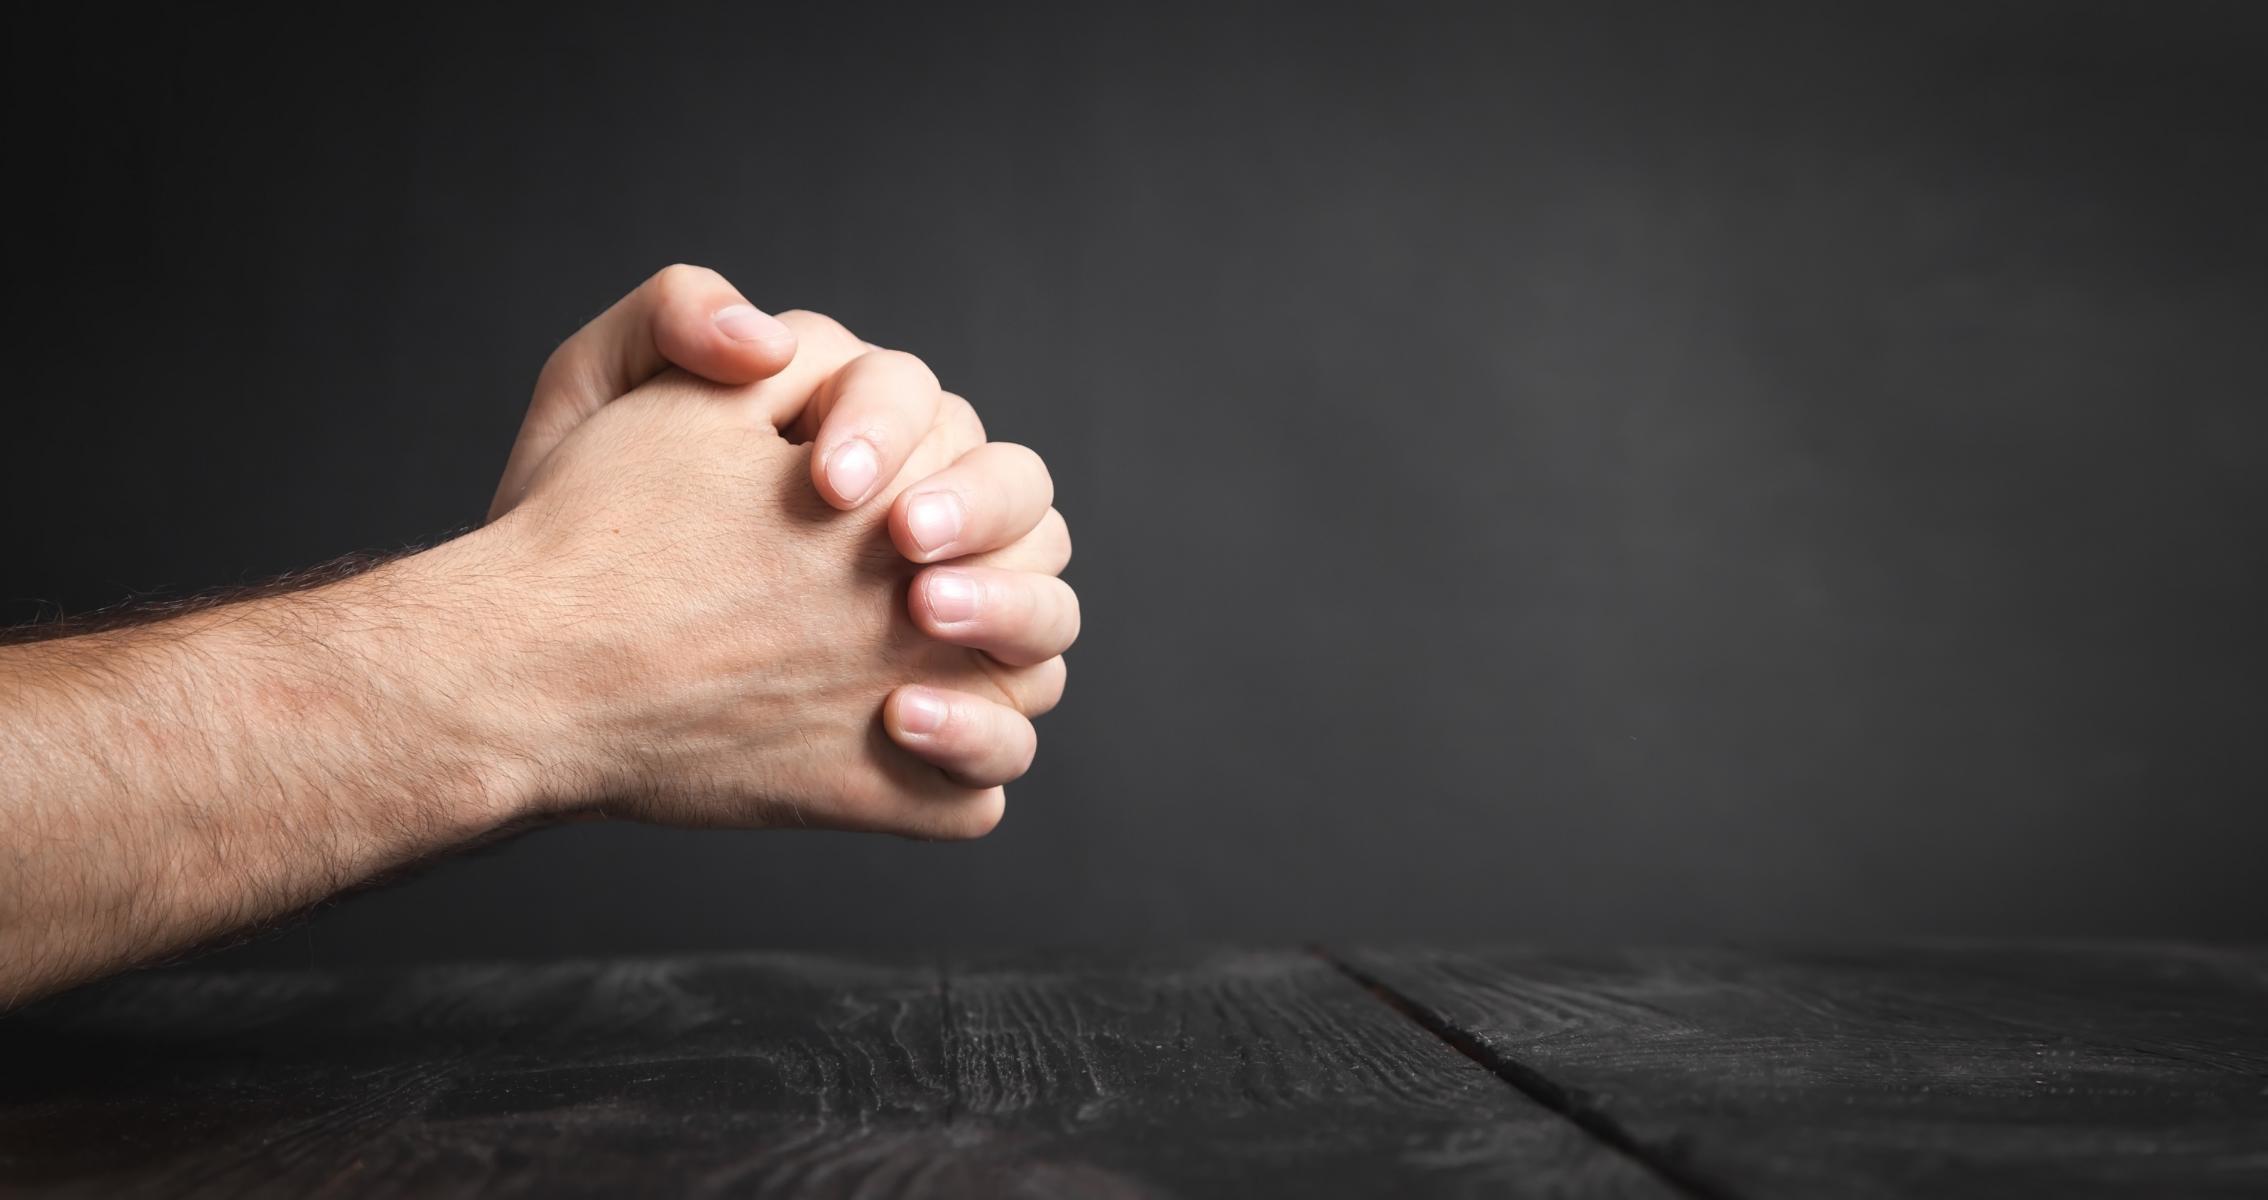 Gnadengesuch und Begnadigungsverfahren: Gnade geht vor Recht? - BERATUNG.DE